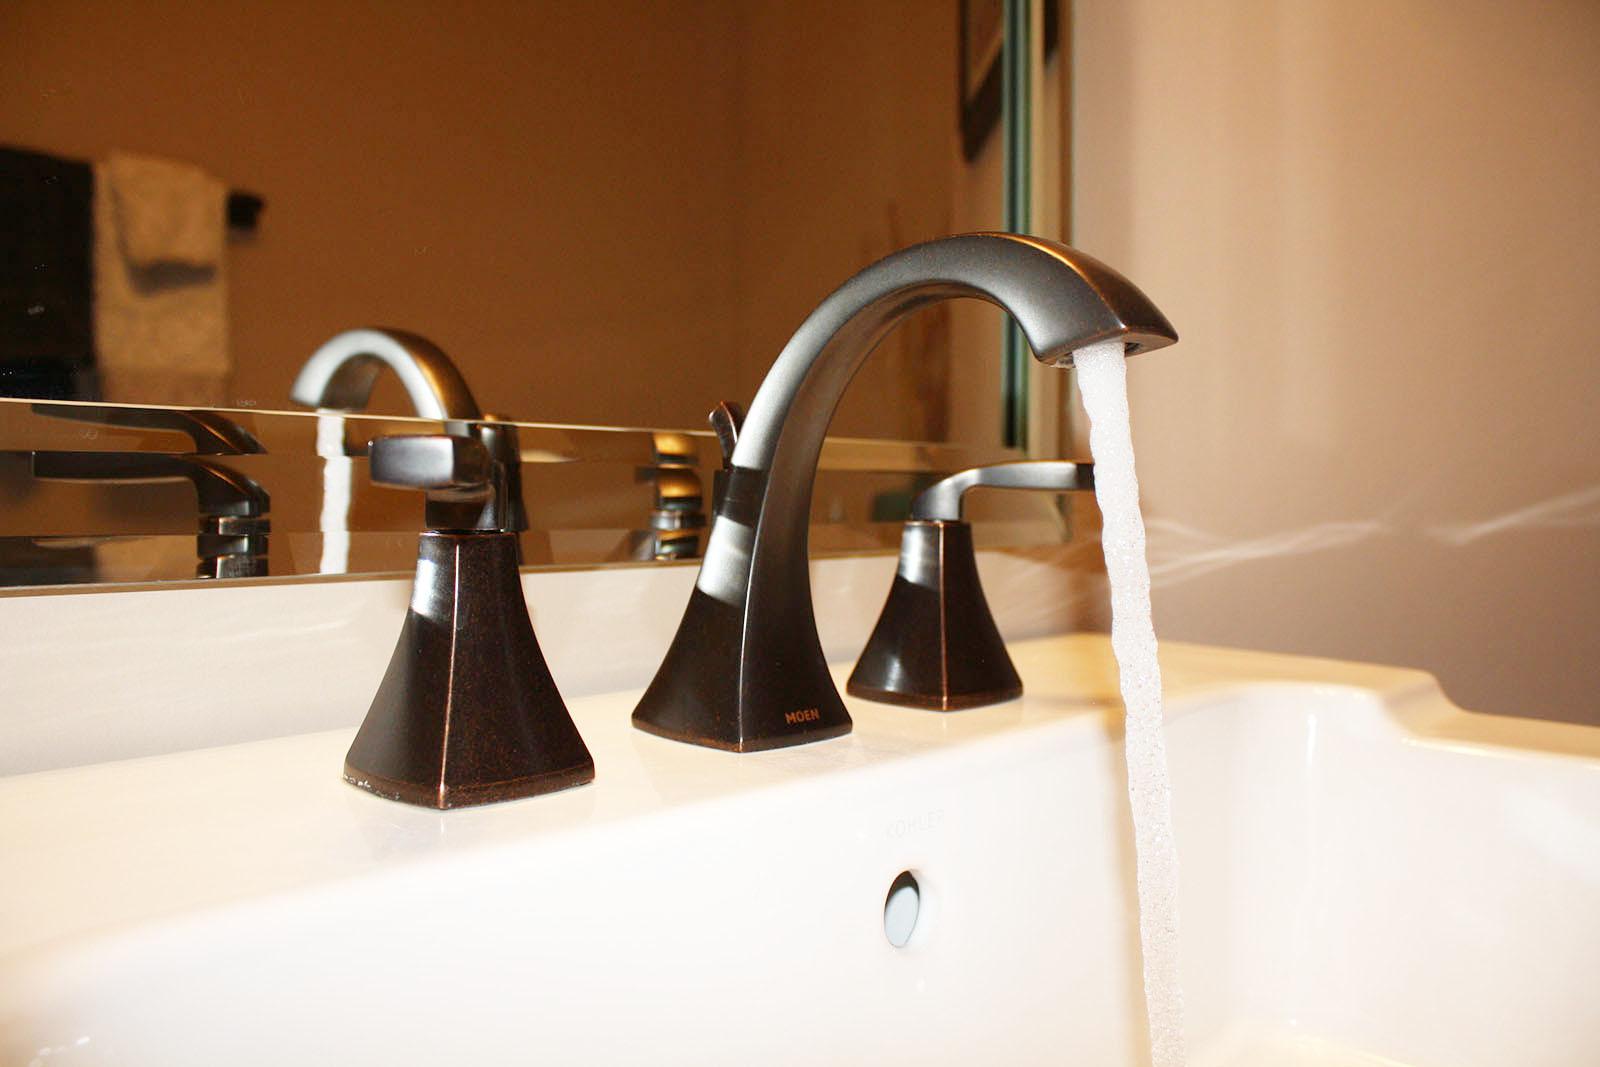 moen voss faucet series review the